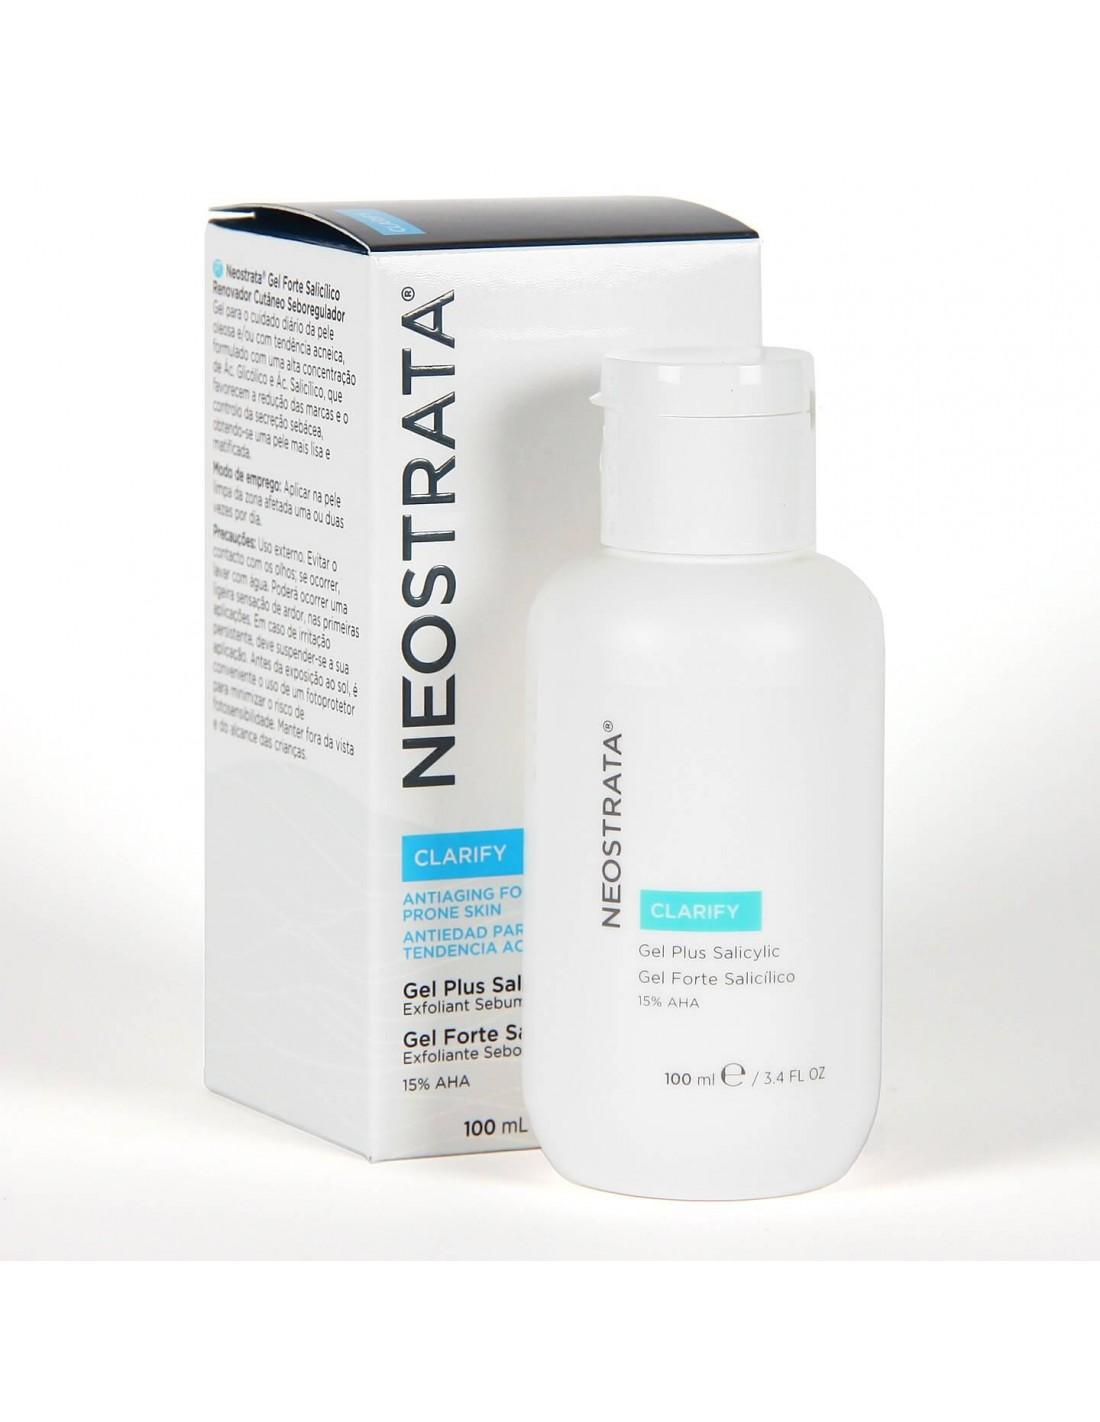 Neostrata Clarify Gel Forte Salicilico 100ml Online